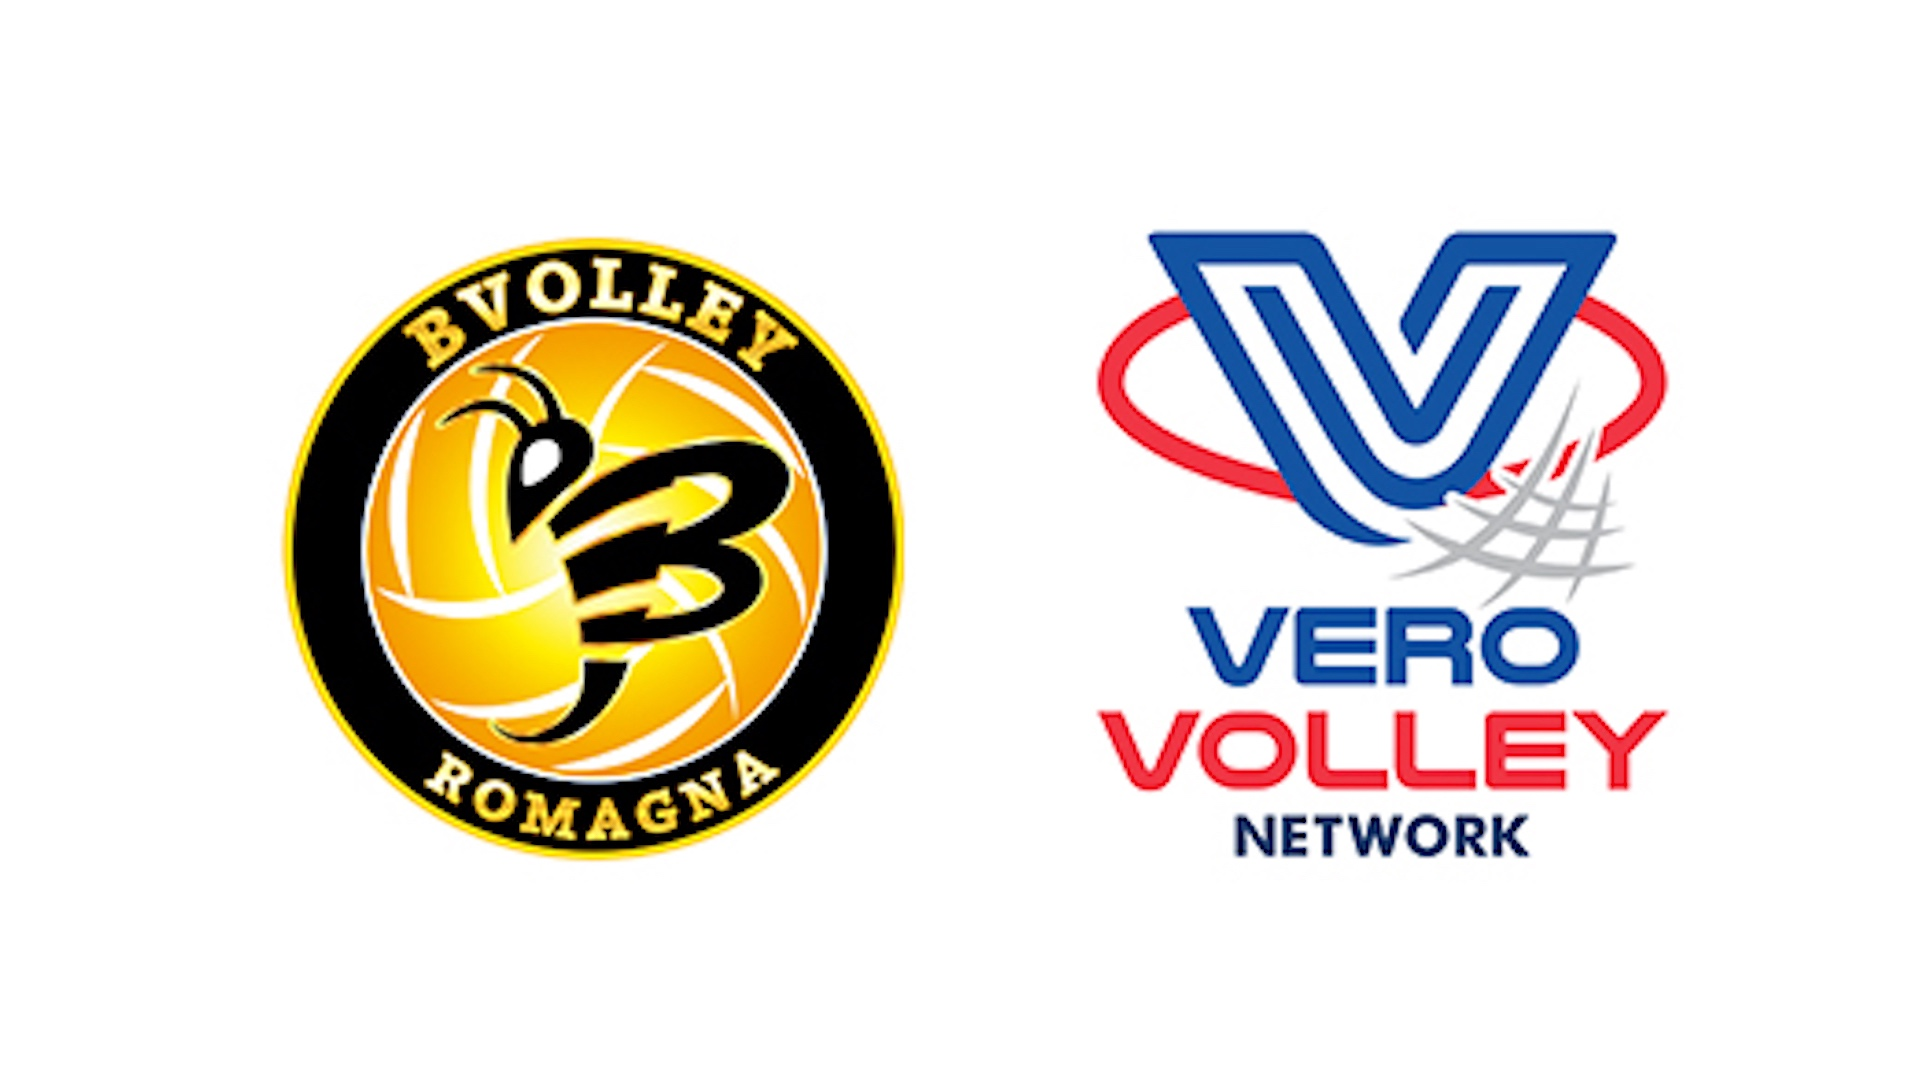 Nuovo ingresso nel Vero Volley Network: benvenuto BVolley Romagna!